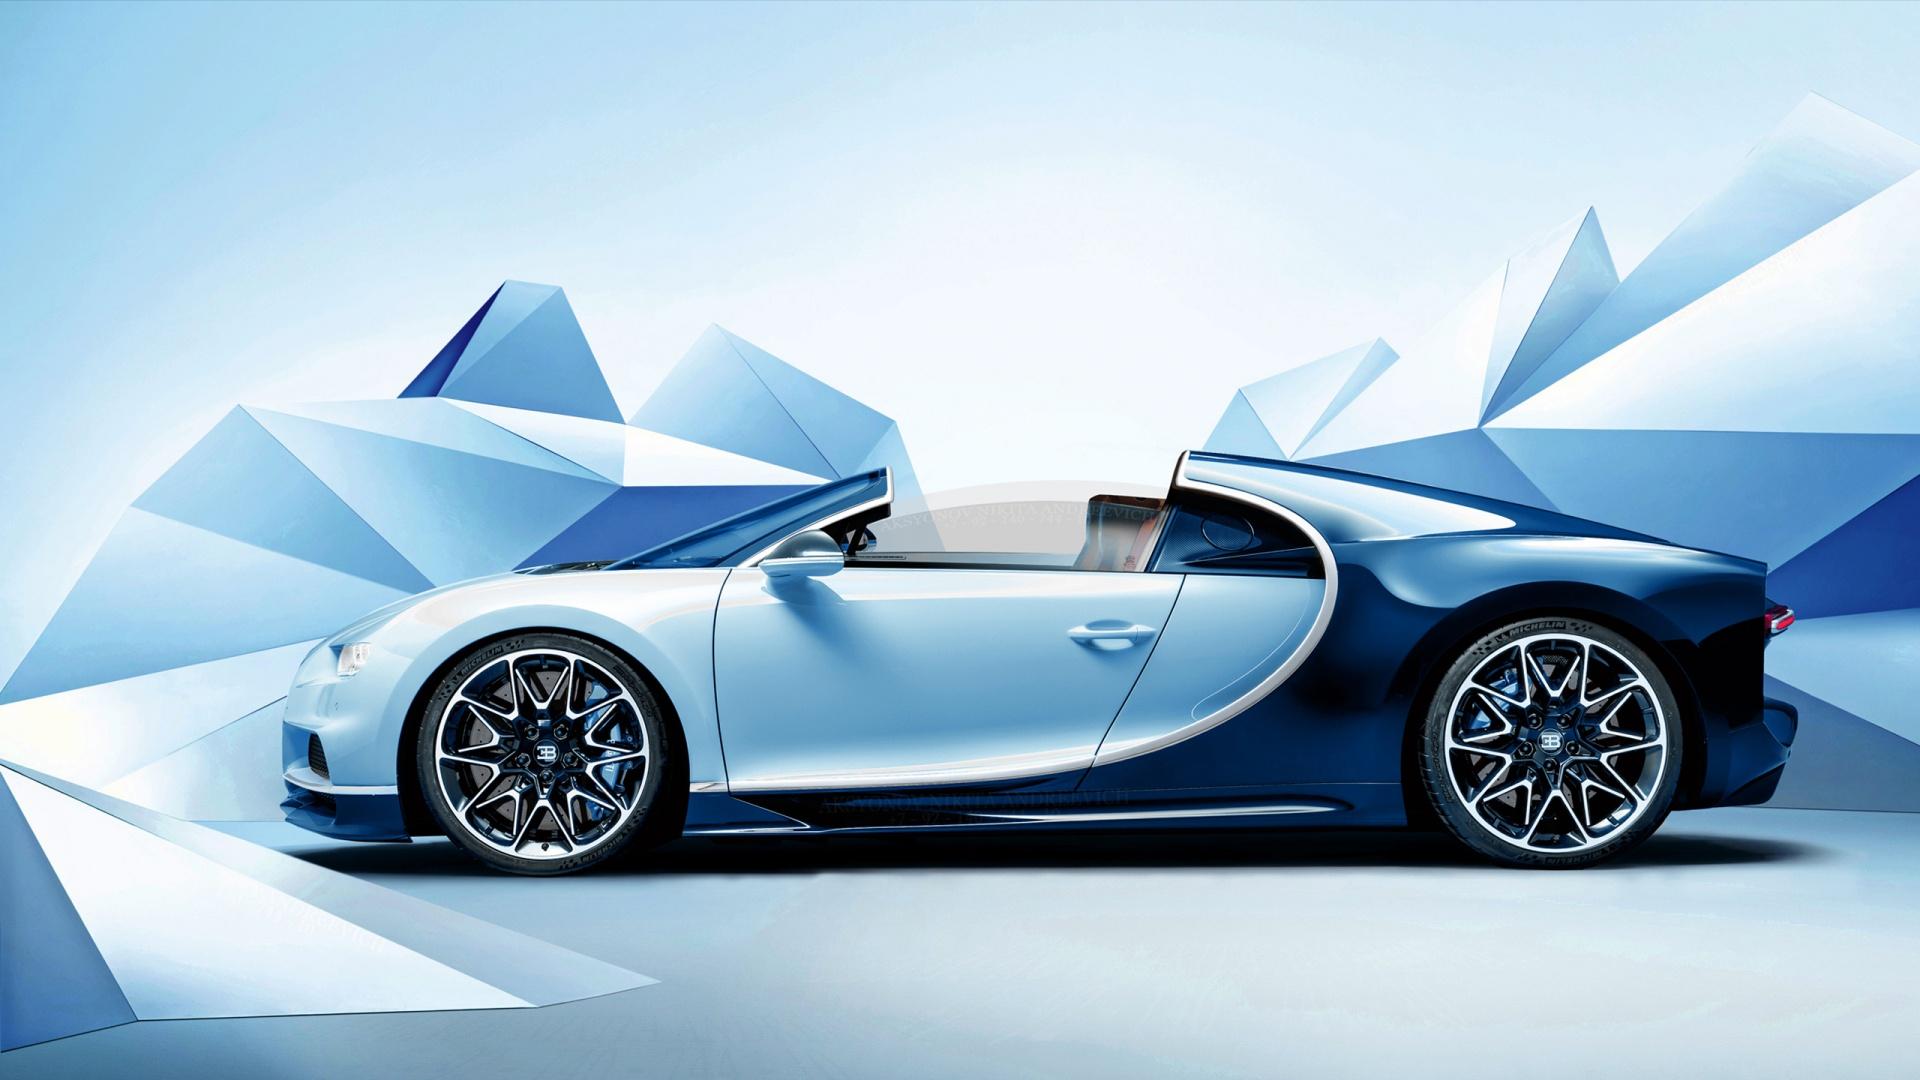 76 Bugatti Wallpapers On Wallpapersafari